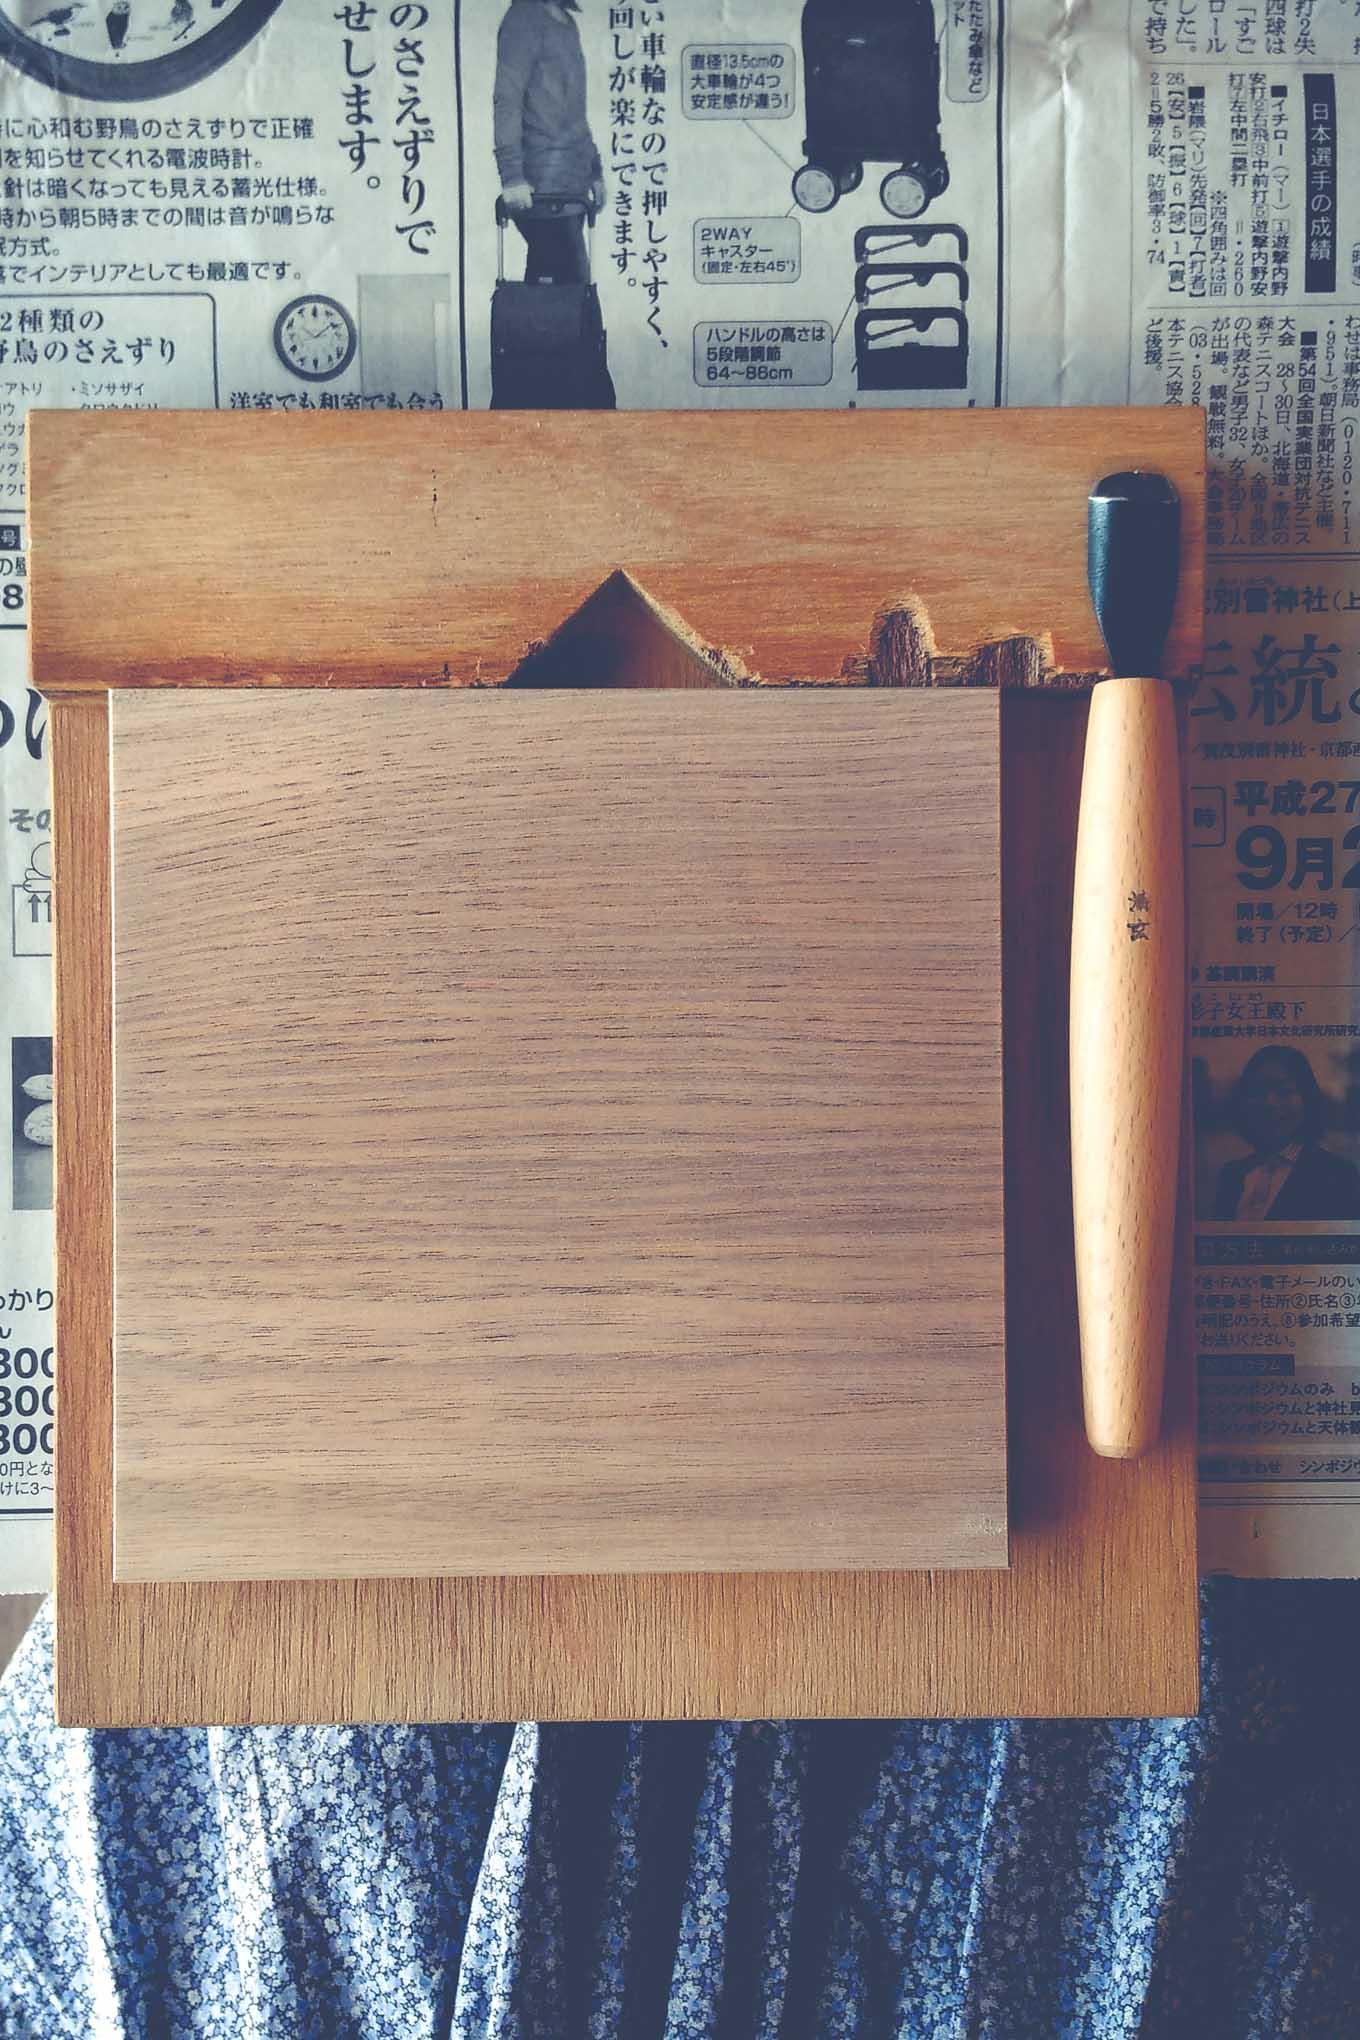 kaga-masayuki-wood-plate-8